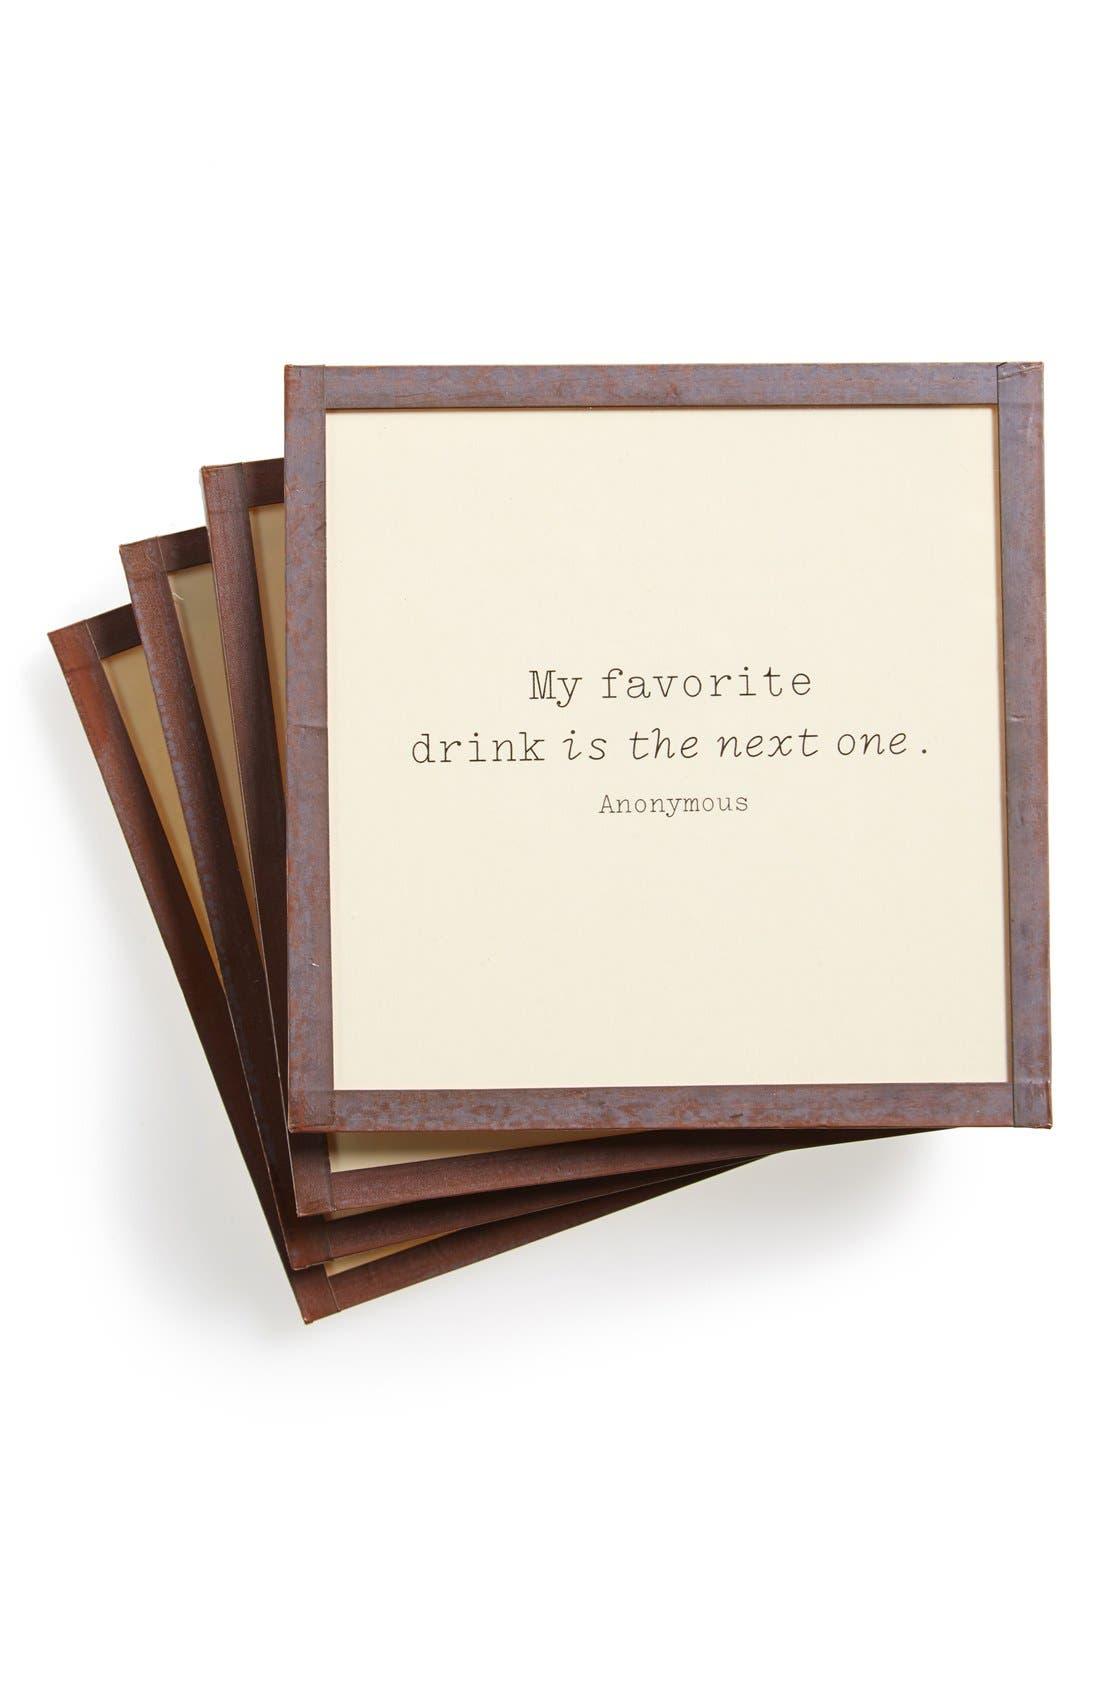 Alternate Image 1 Selected - Ben's Garden 'My Favorite Drink' Coasters (Set of 4)